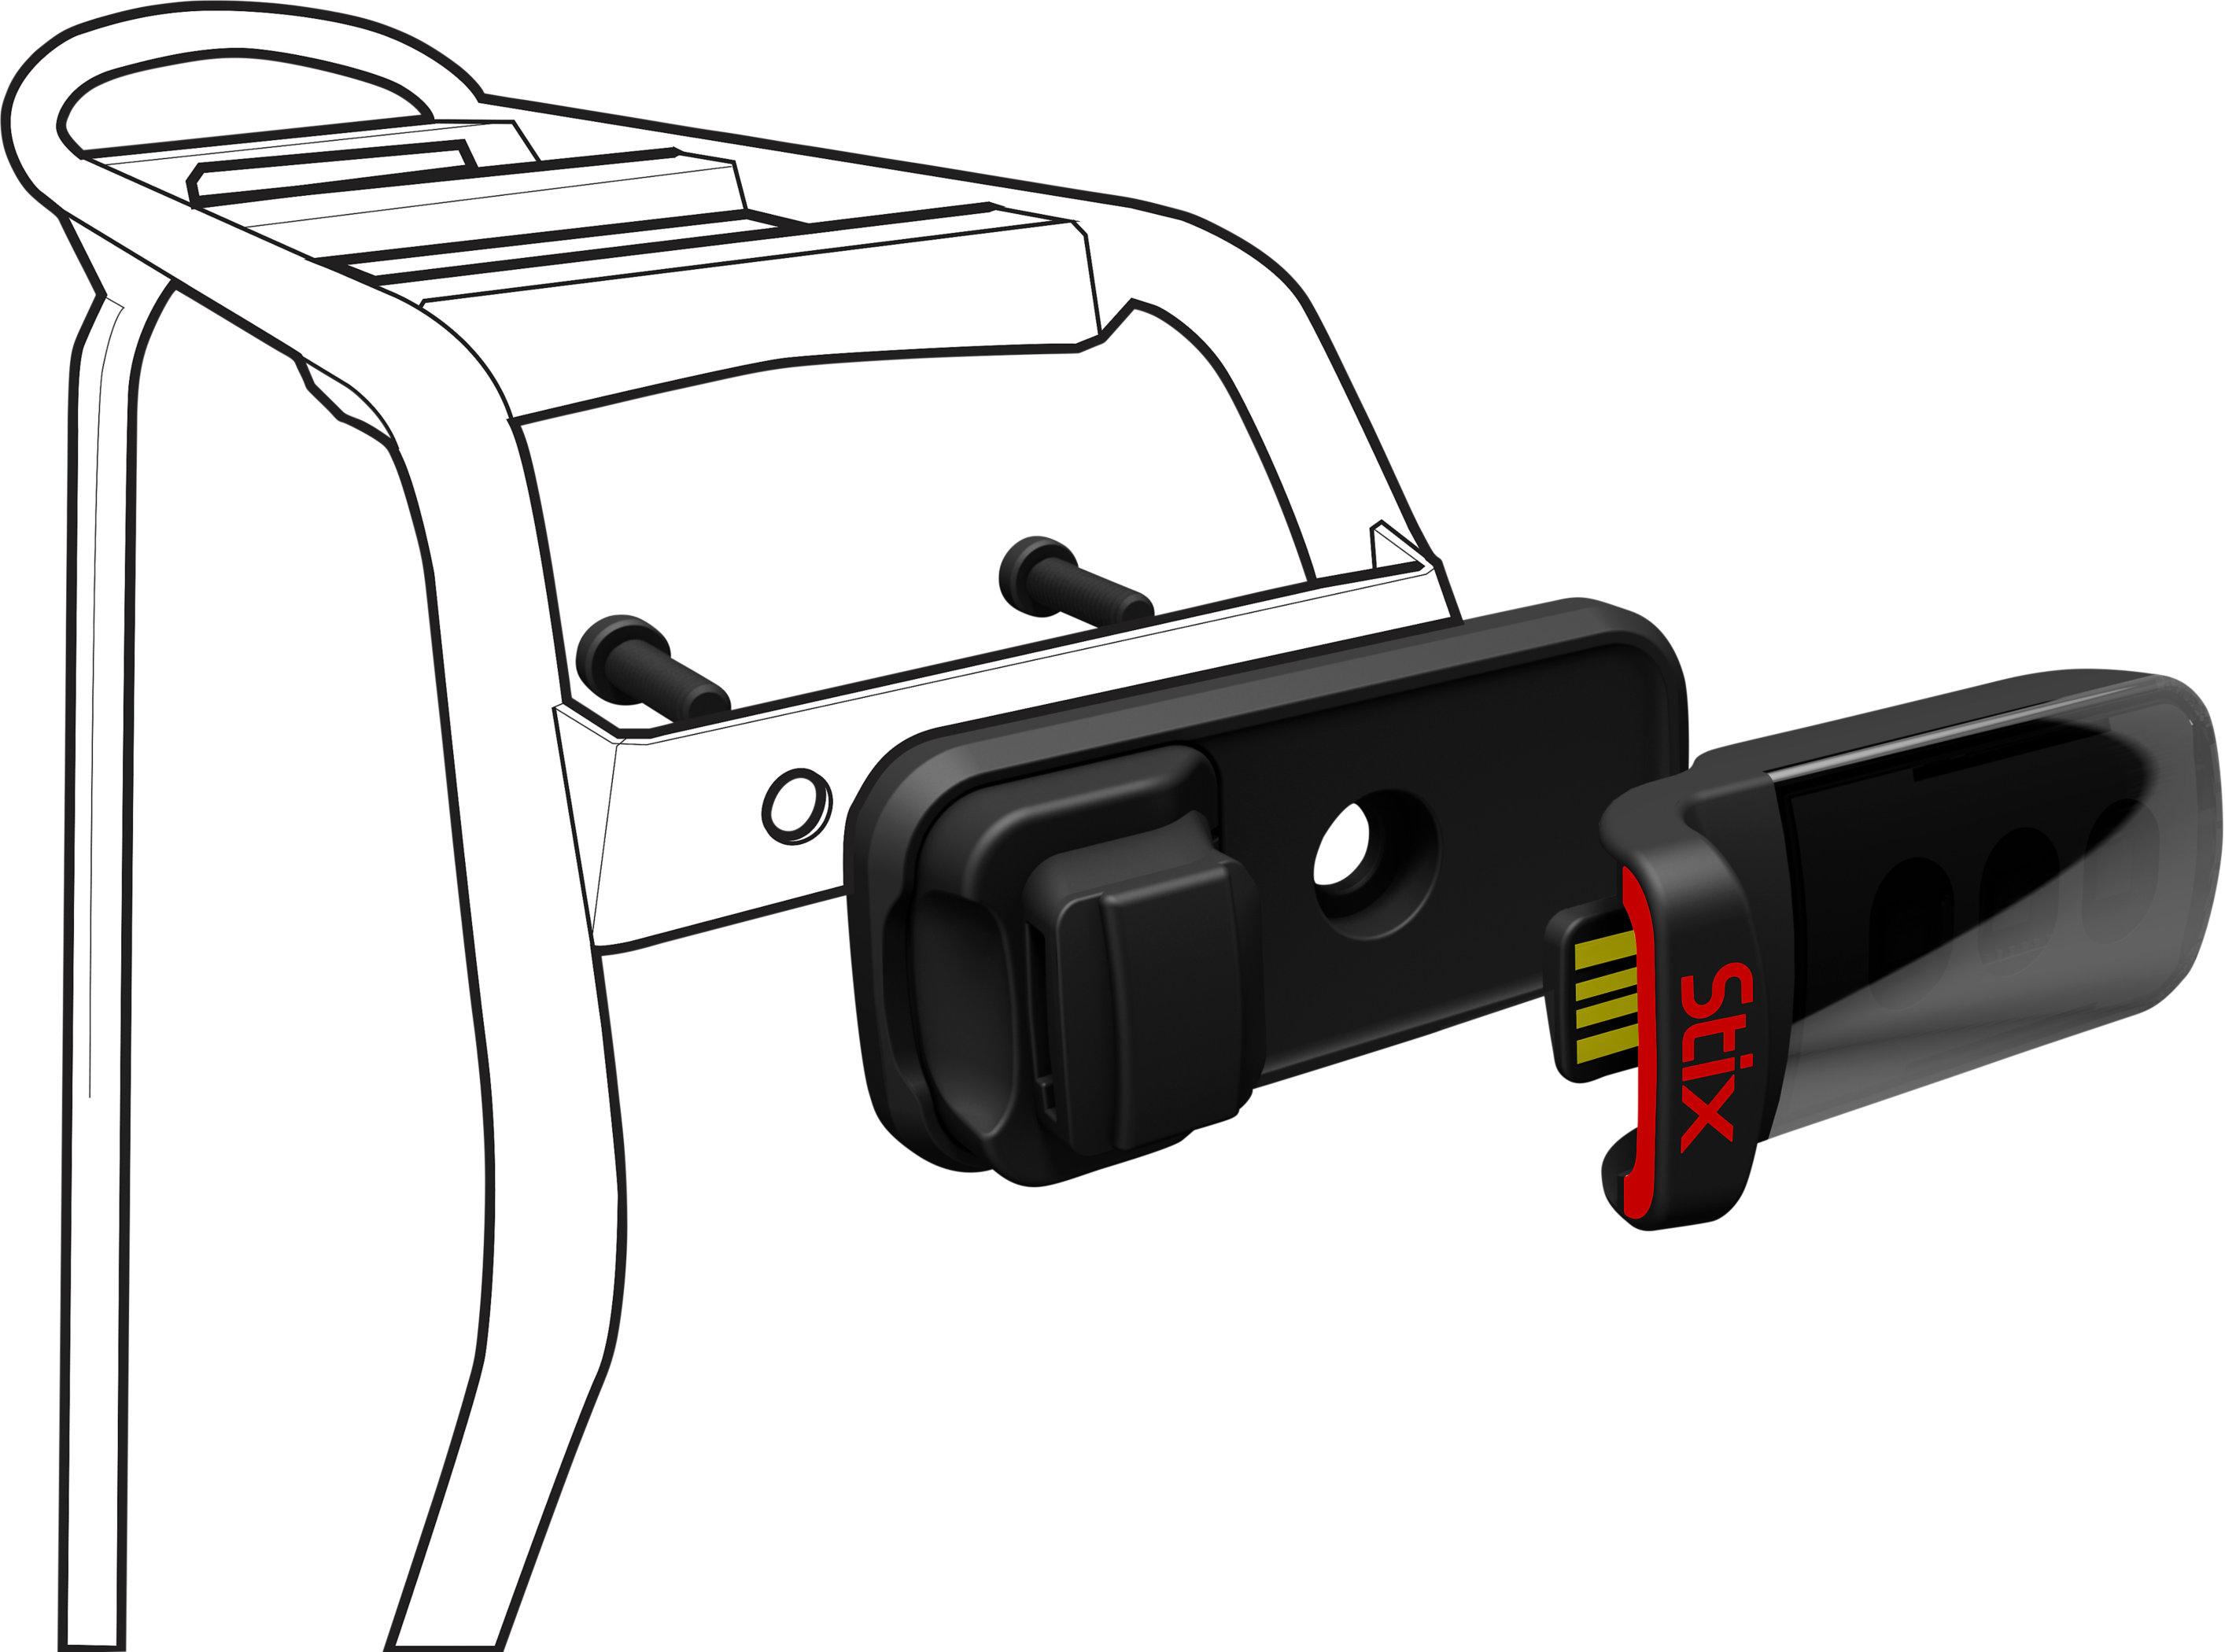 2020 Specialized Stix Reflector Mount Specialized Concept